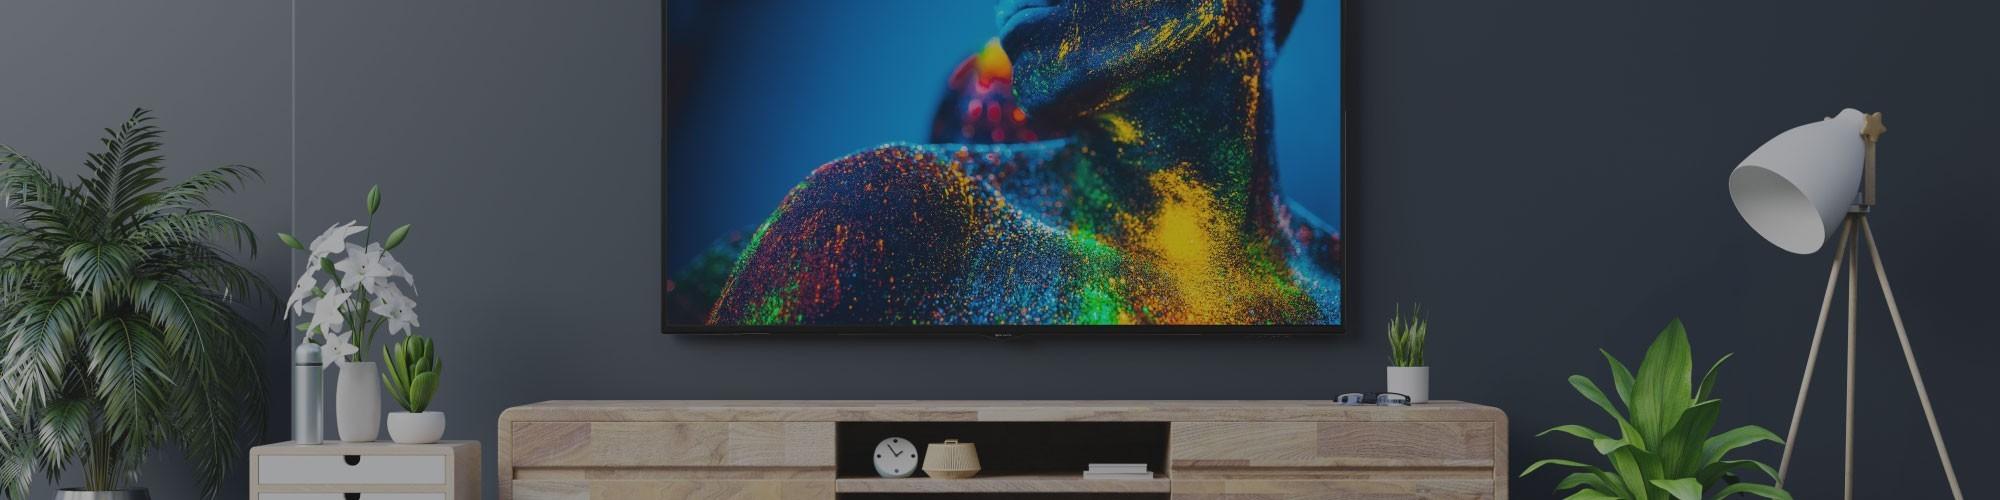 ▷ Comprar Televisores Online